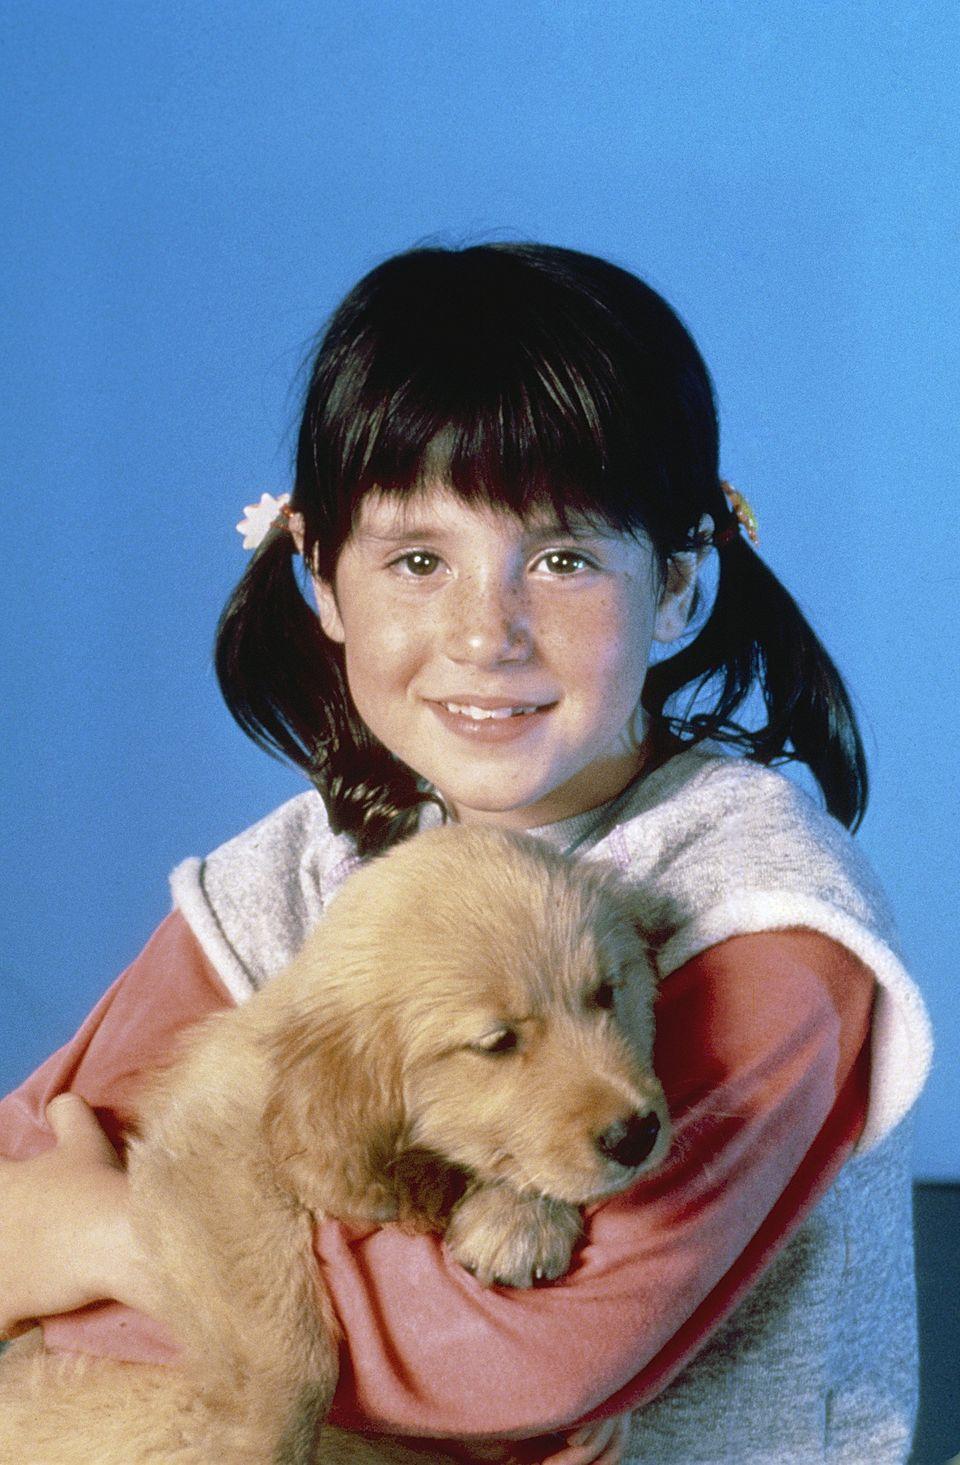 PUNKY BREWSTER -- Season 1 -- Pictured: (l-r) Soleil Moon Frye as Penelope 'Punky' Brewster, Brandon the Wonder Dog -- Photo